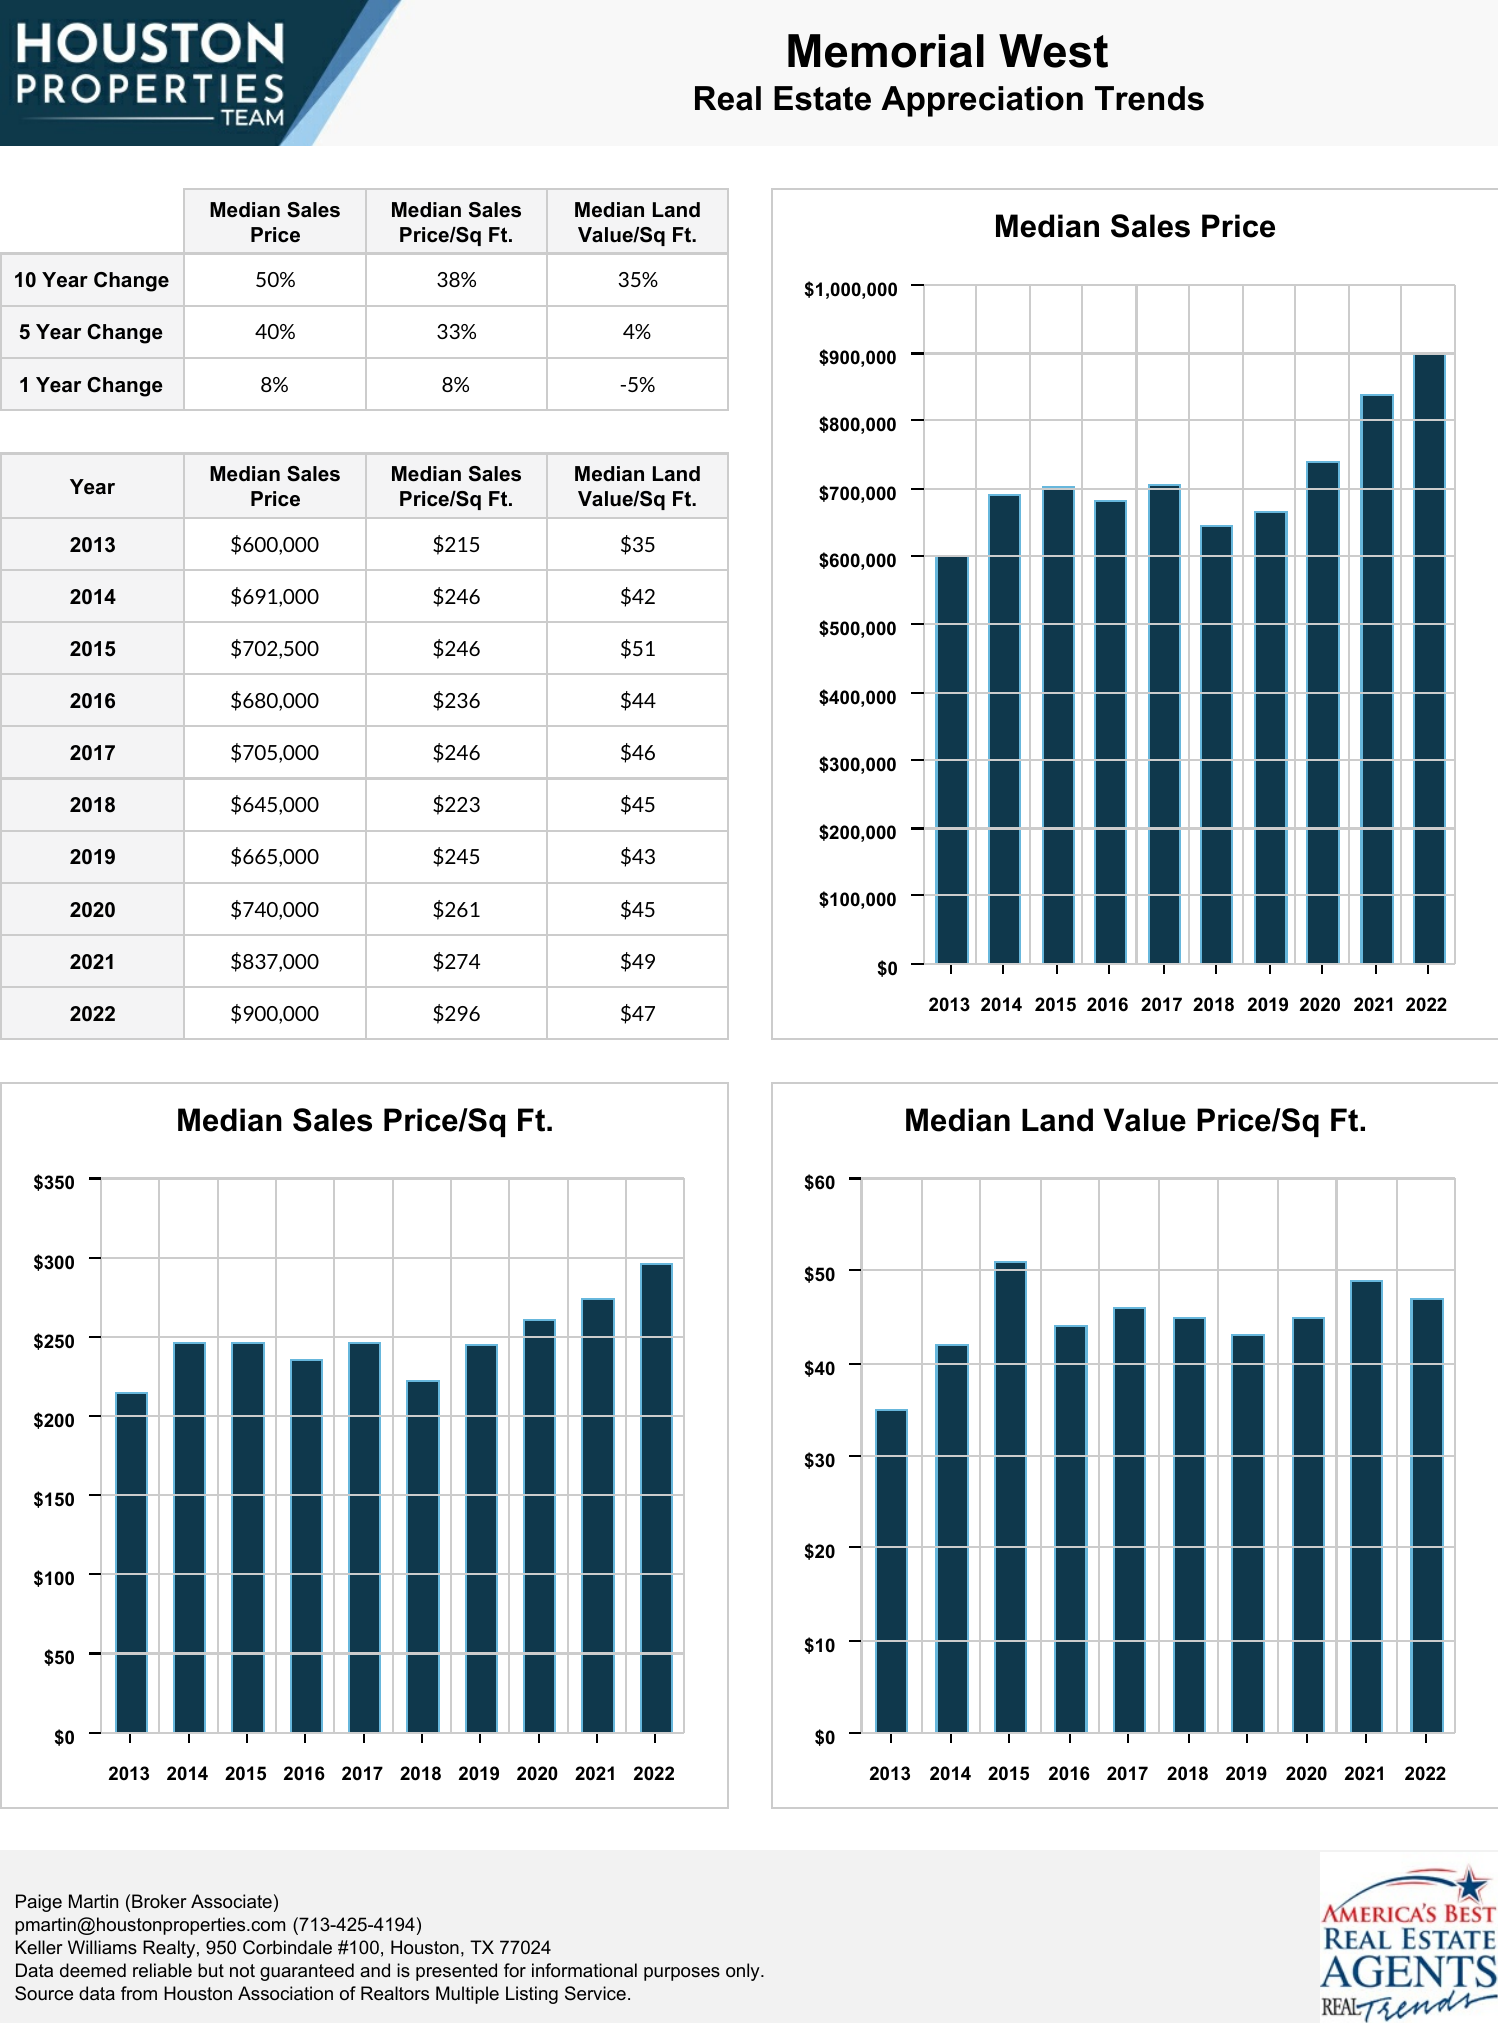 Memorial West Real Estate Trends